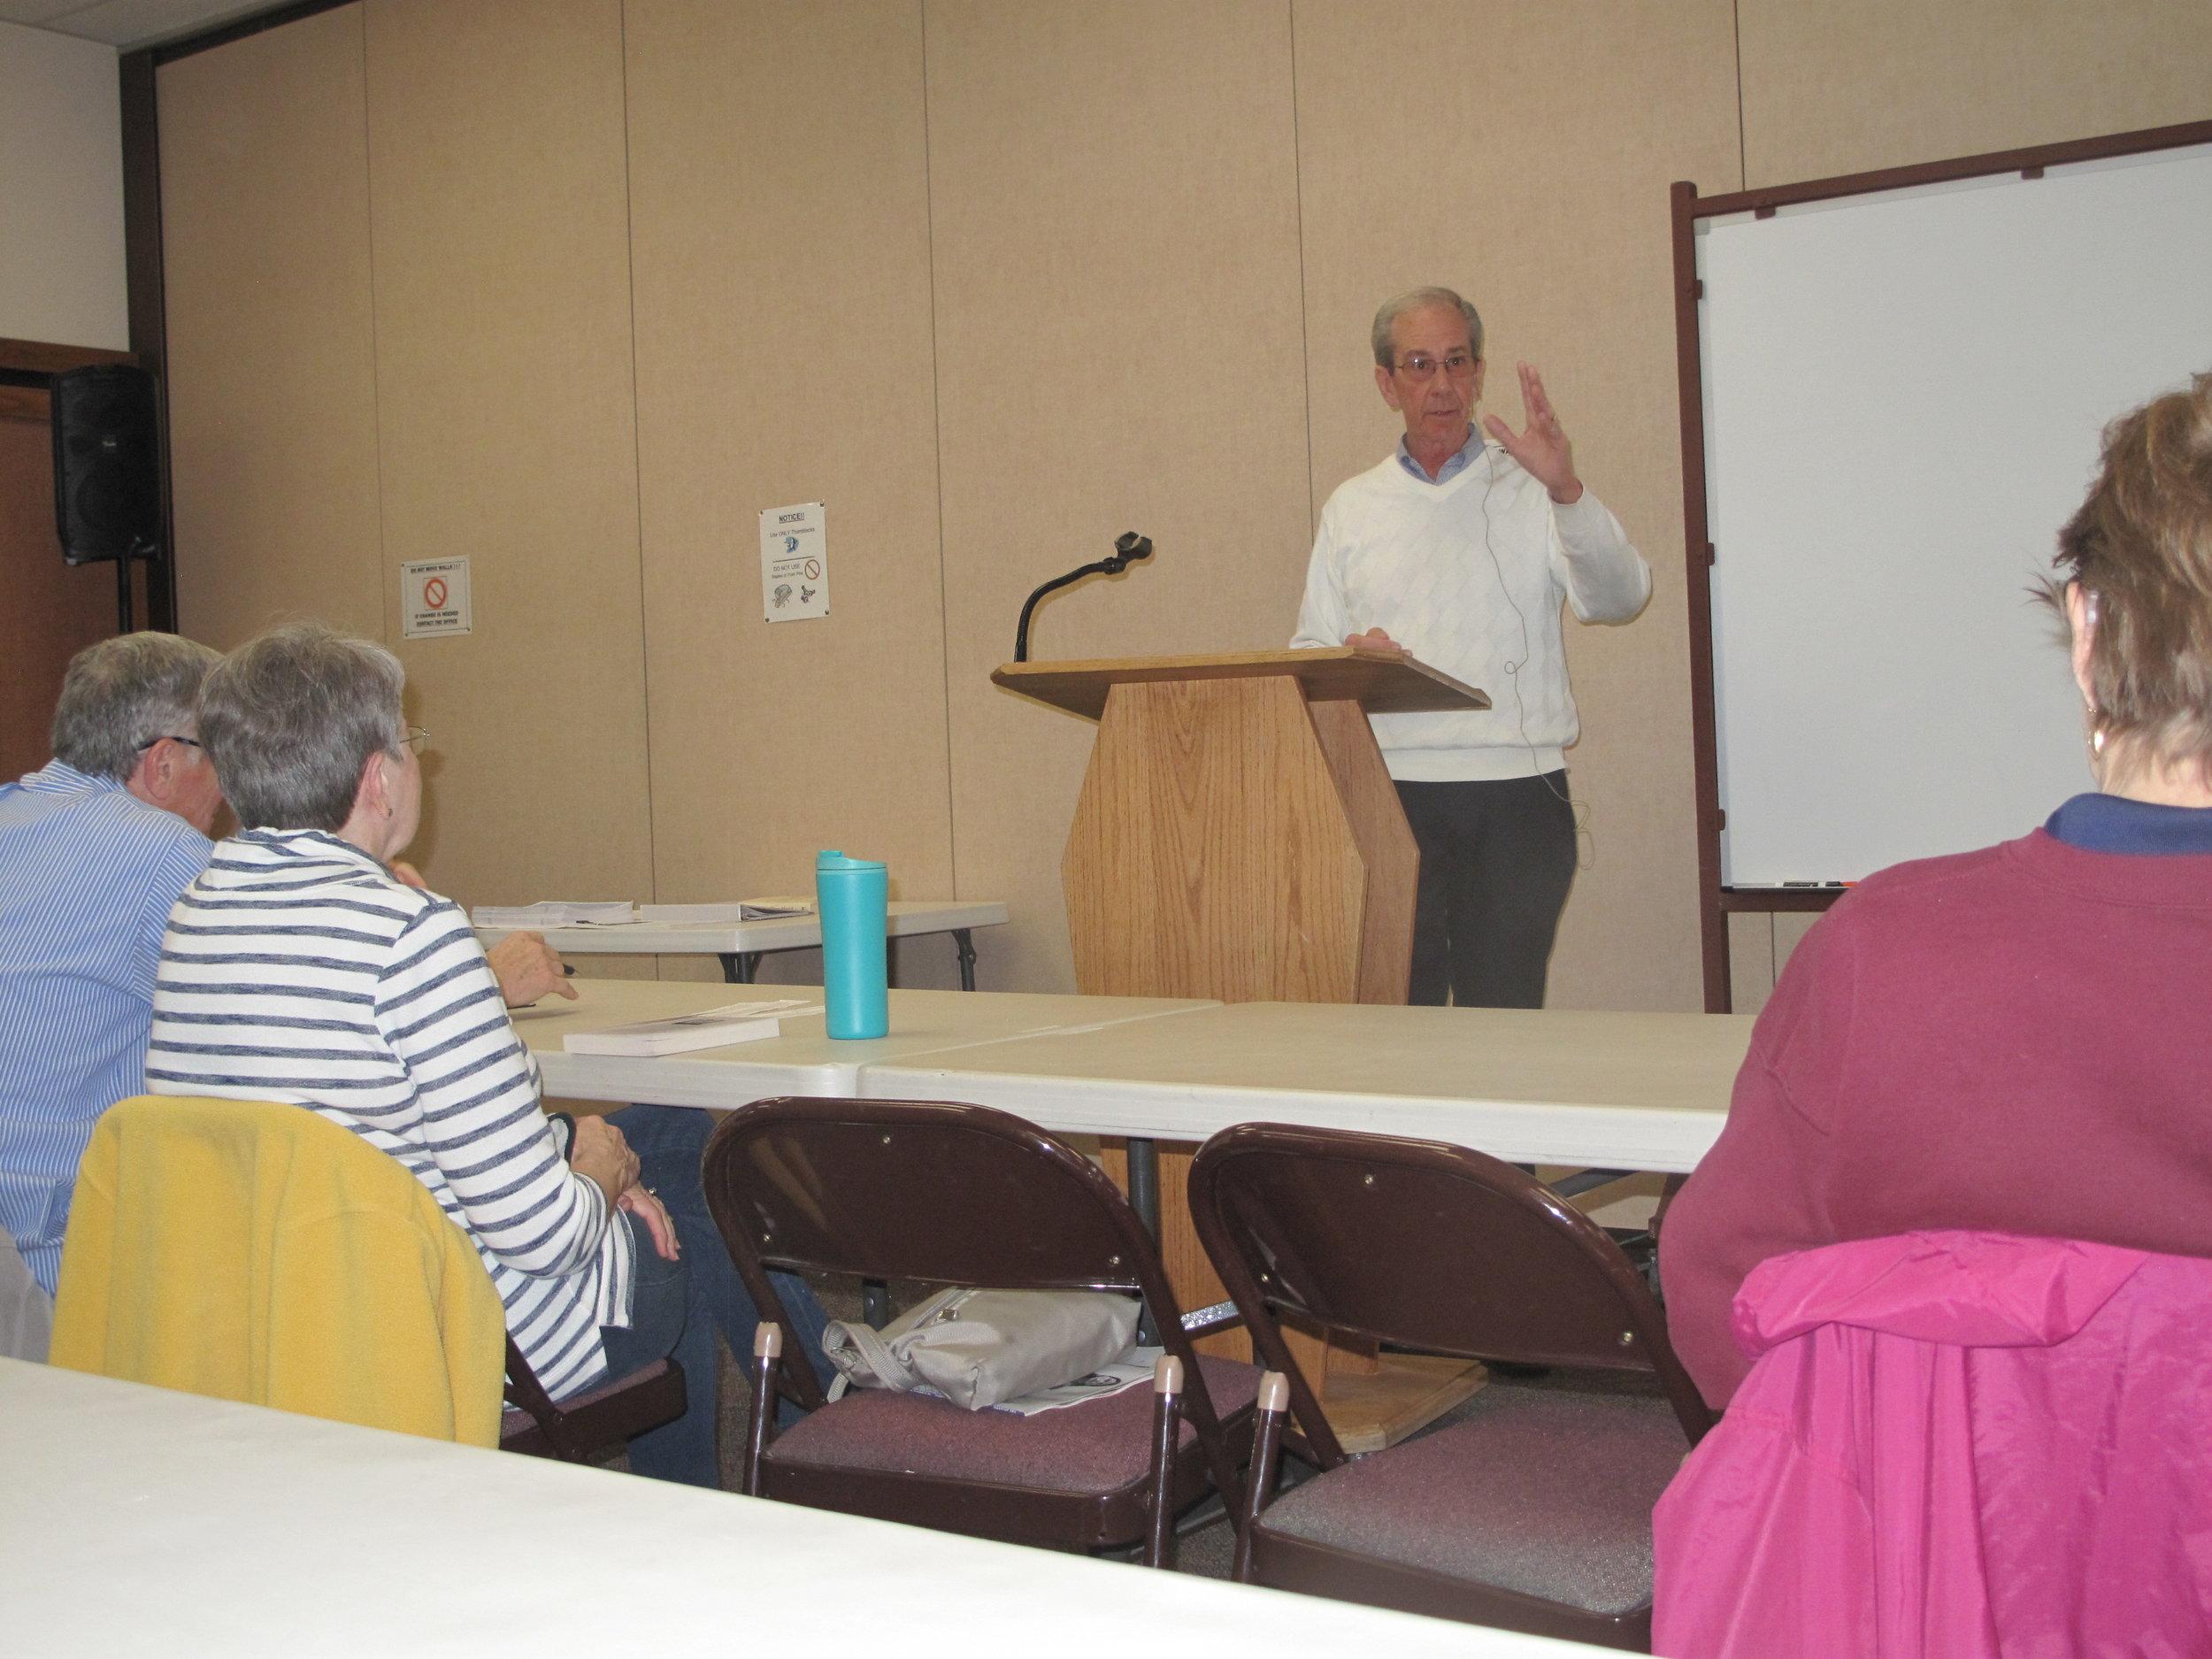 David Teaching 2.JPG